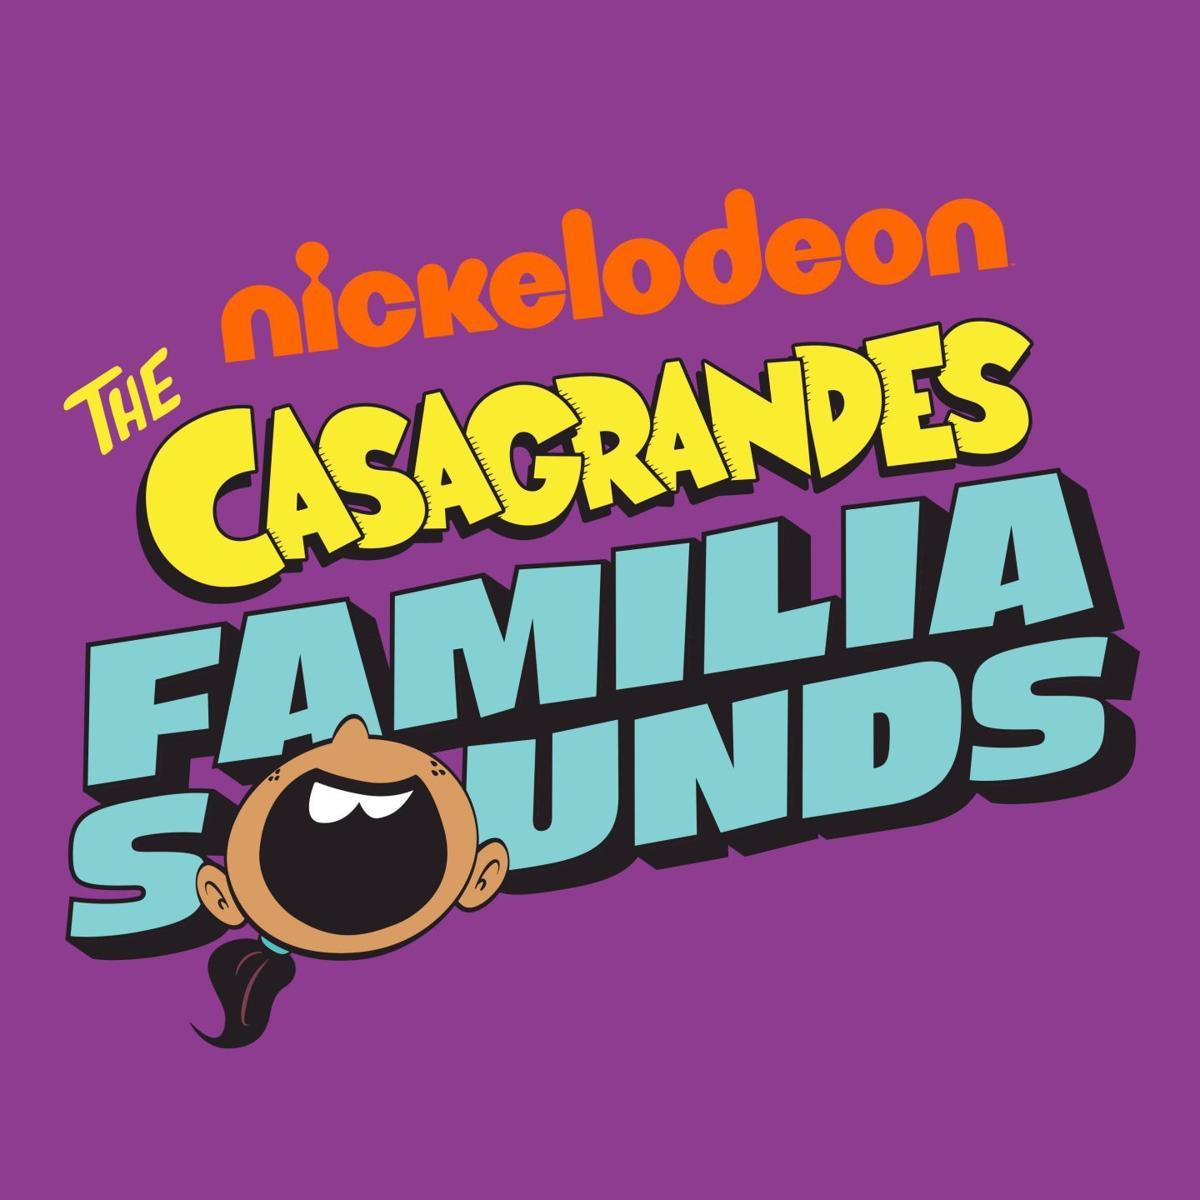 The Casagrandes Familia Sounds